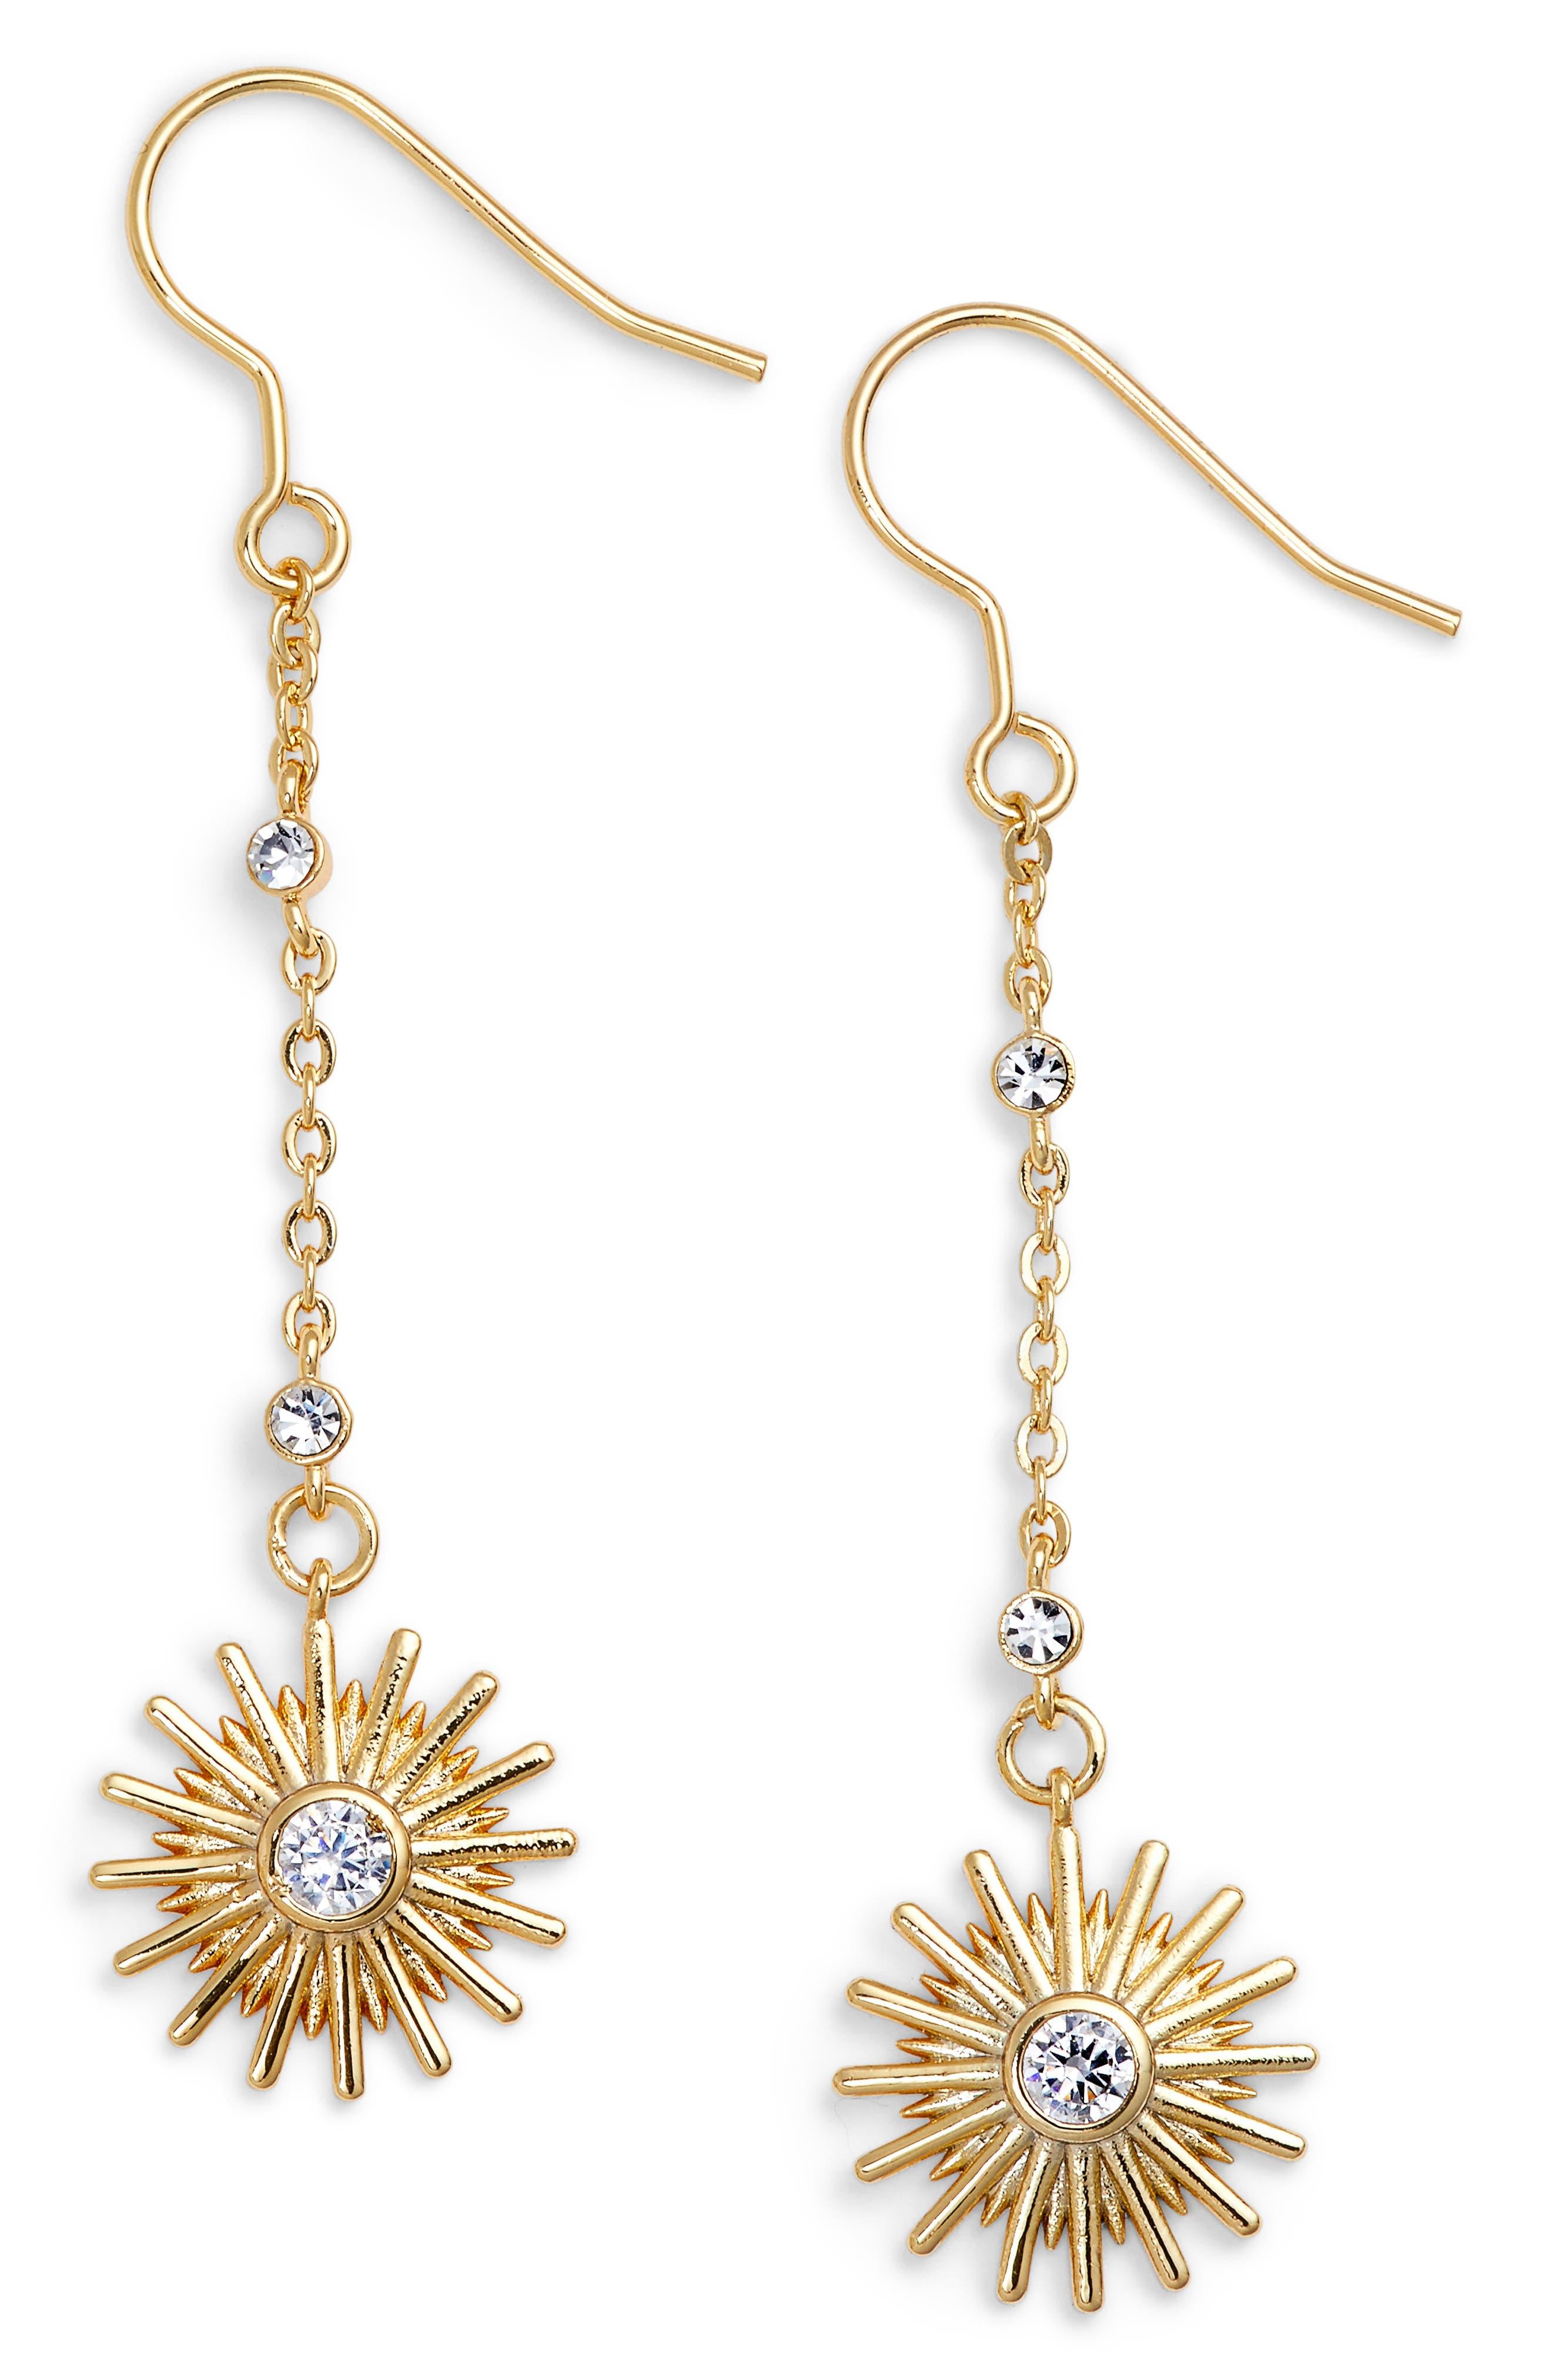 Jules Smith Starburst Drop Earrings